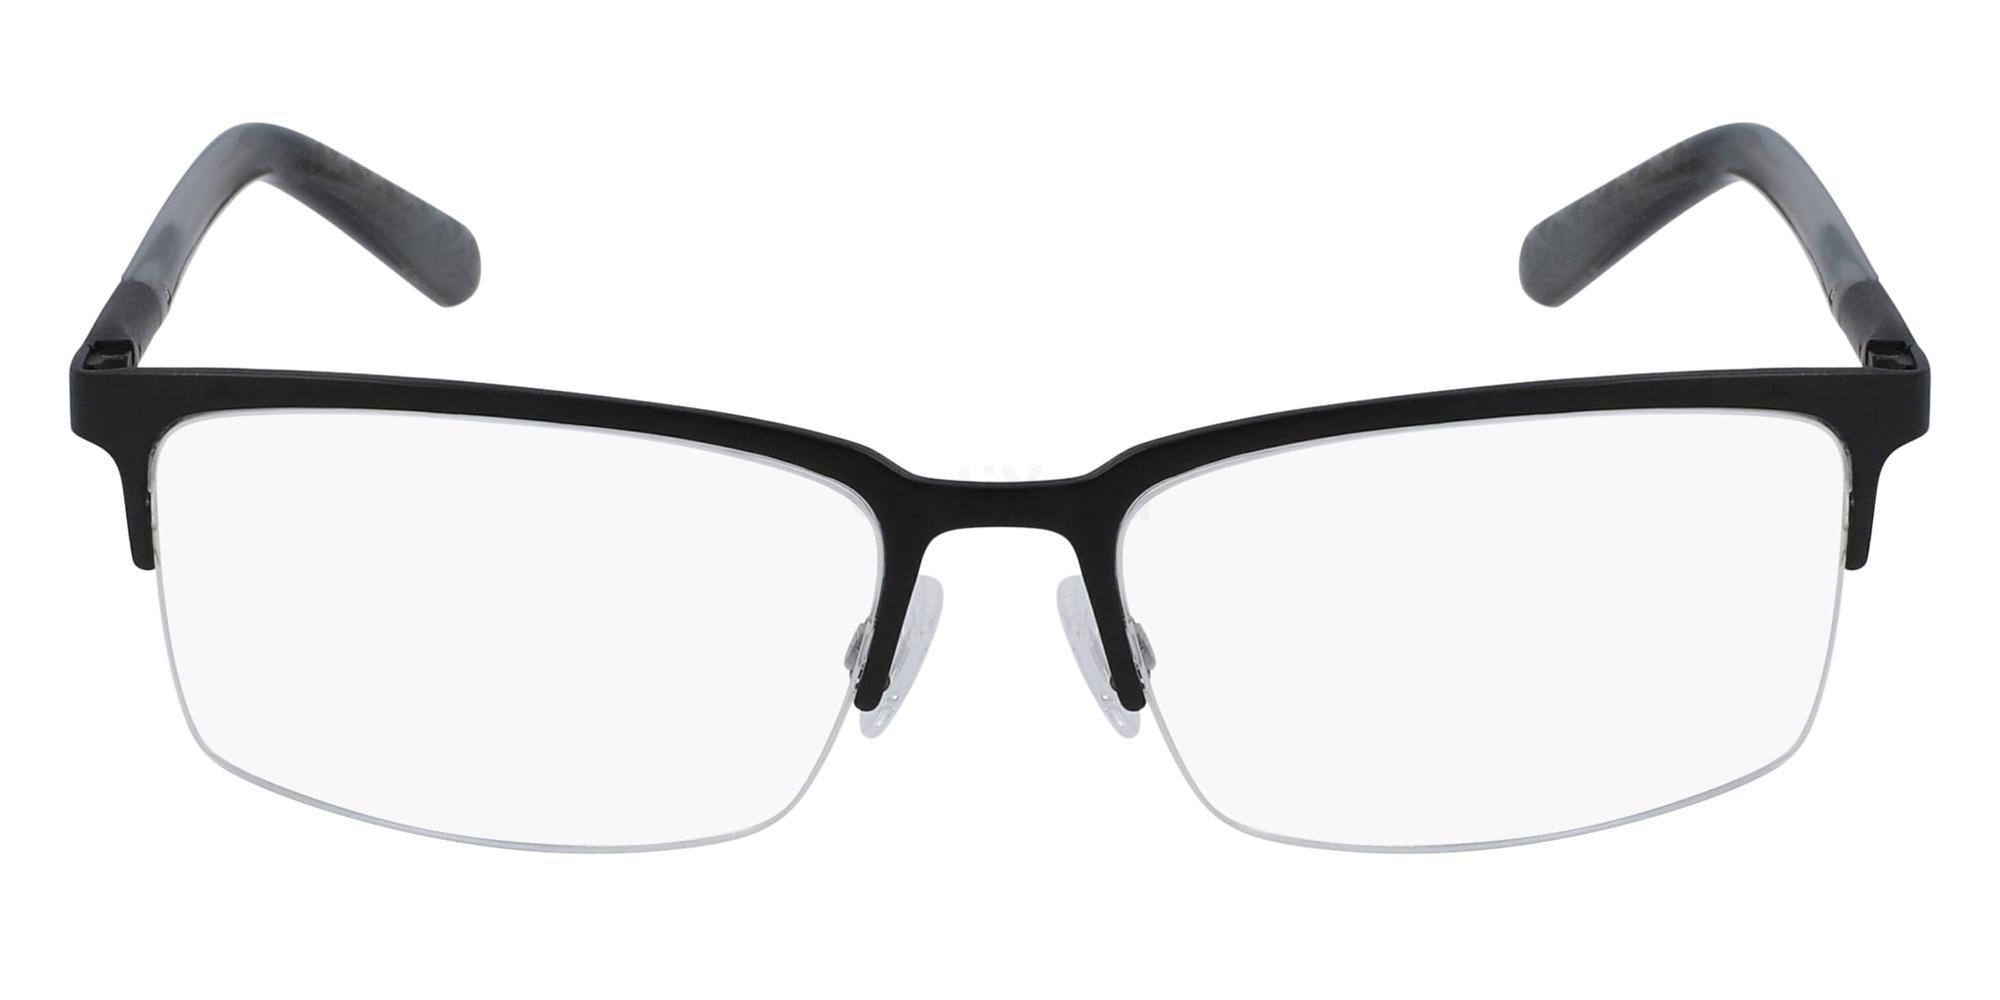 002 DR2014 Glasses, Dragon